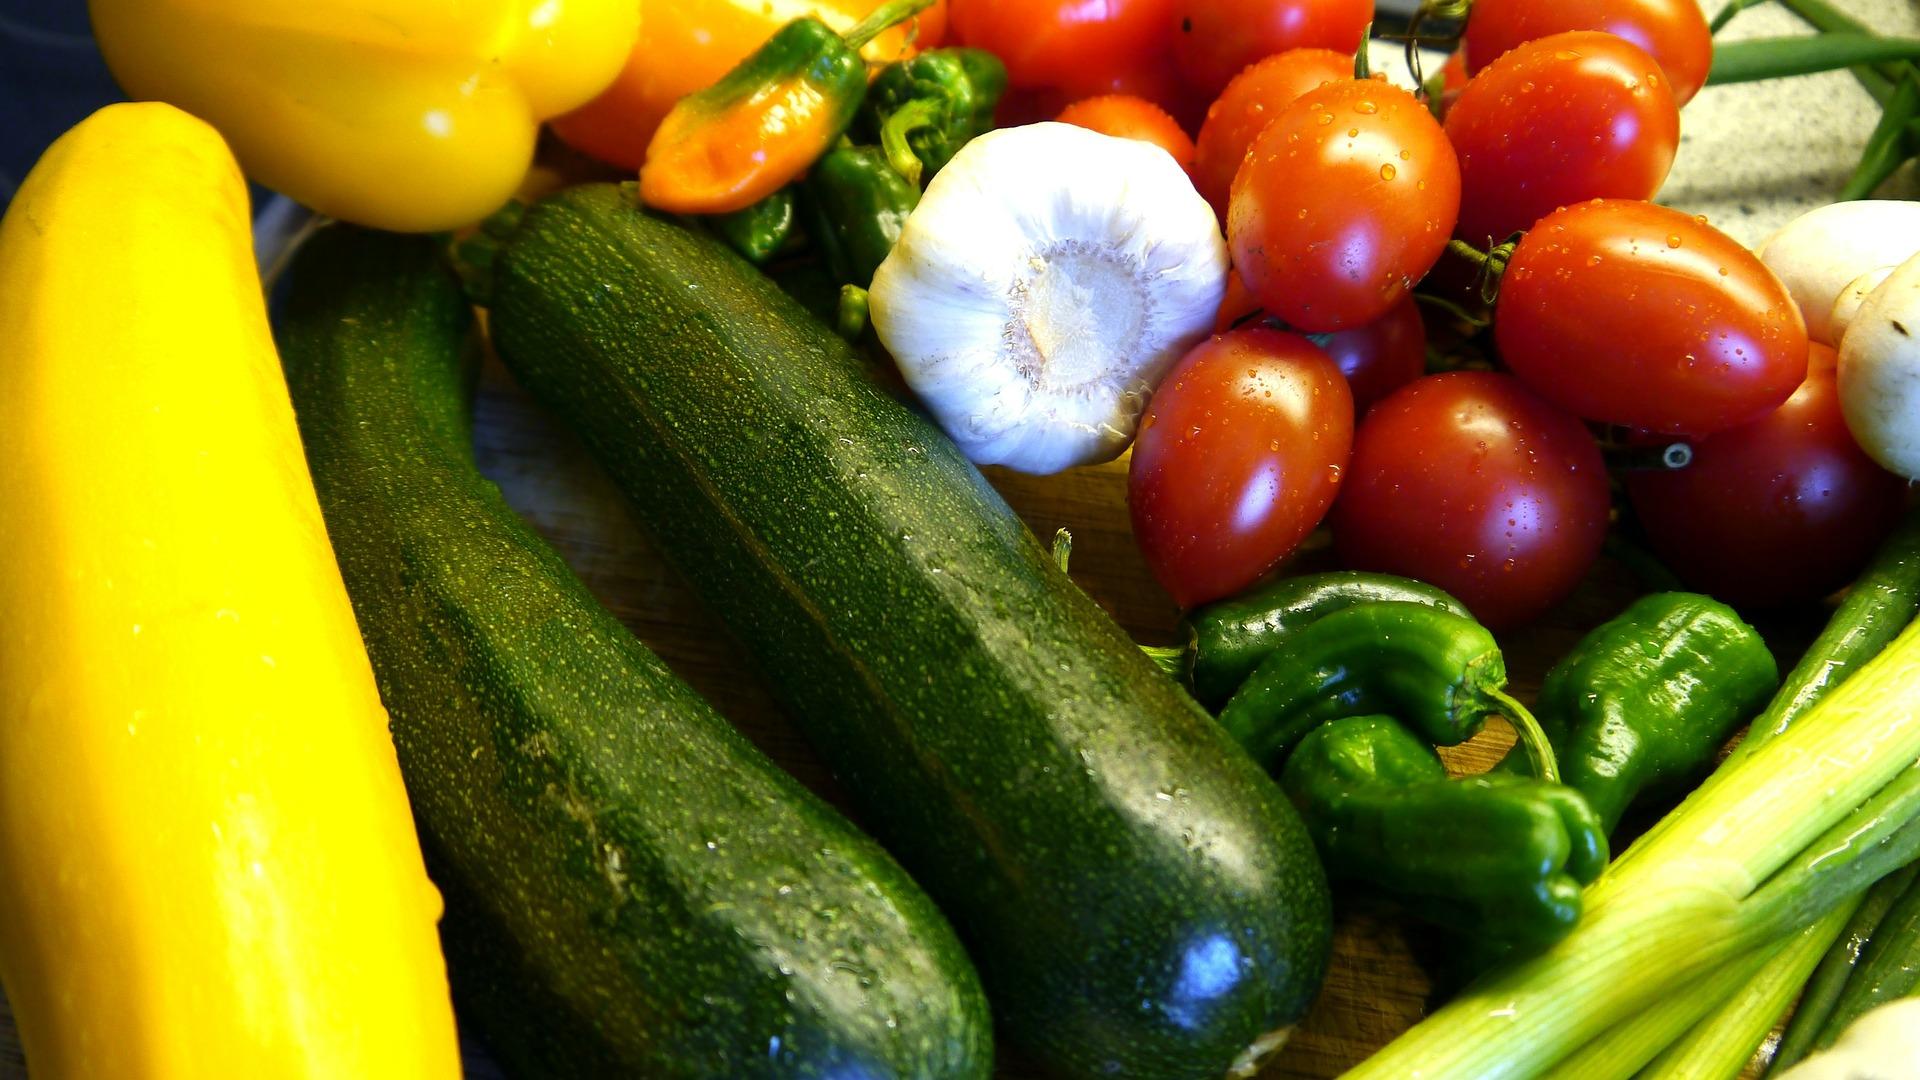 vegetables-331638_1920.jpg